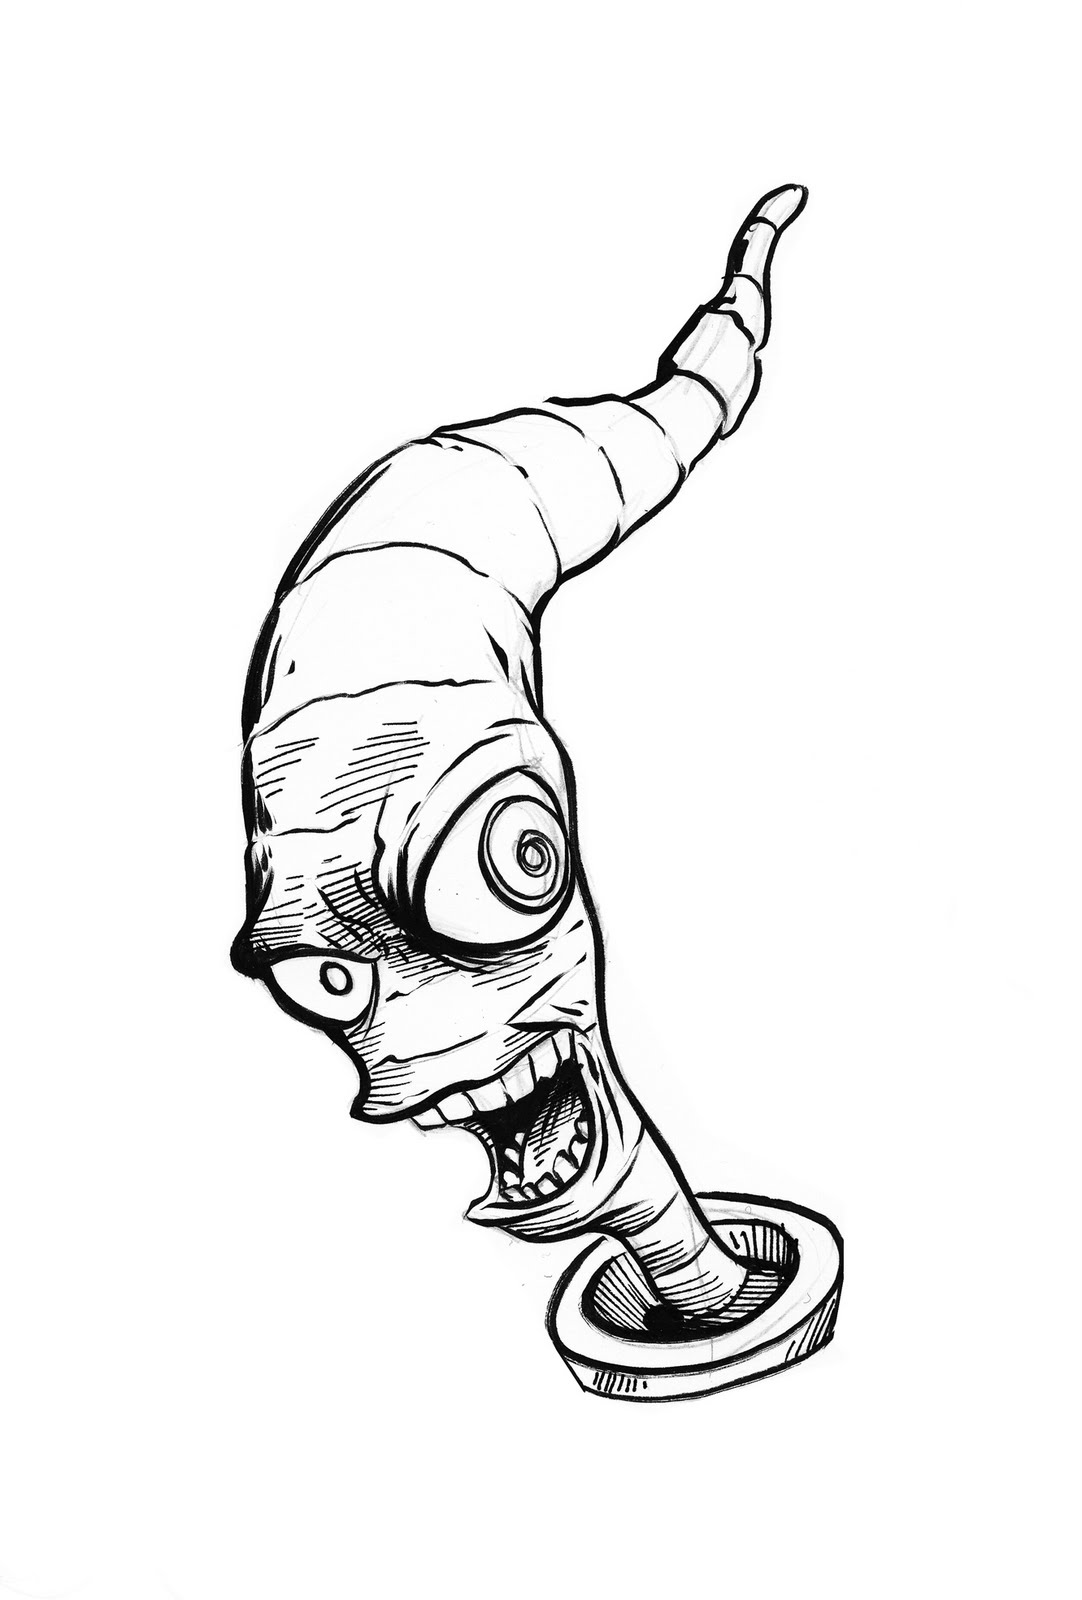 Earthworm Sketch